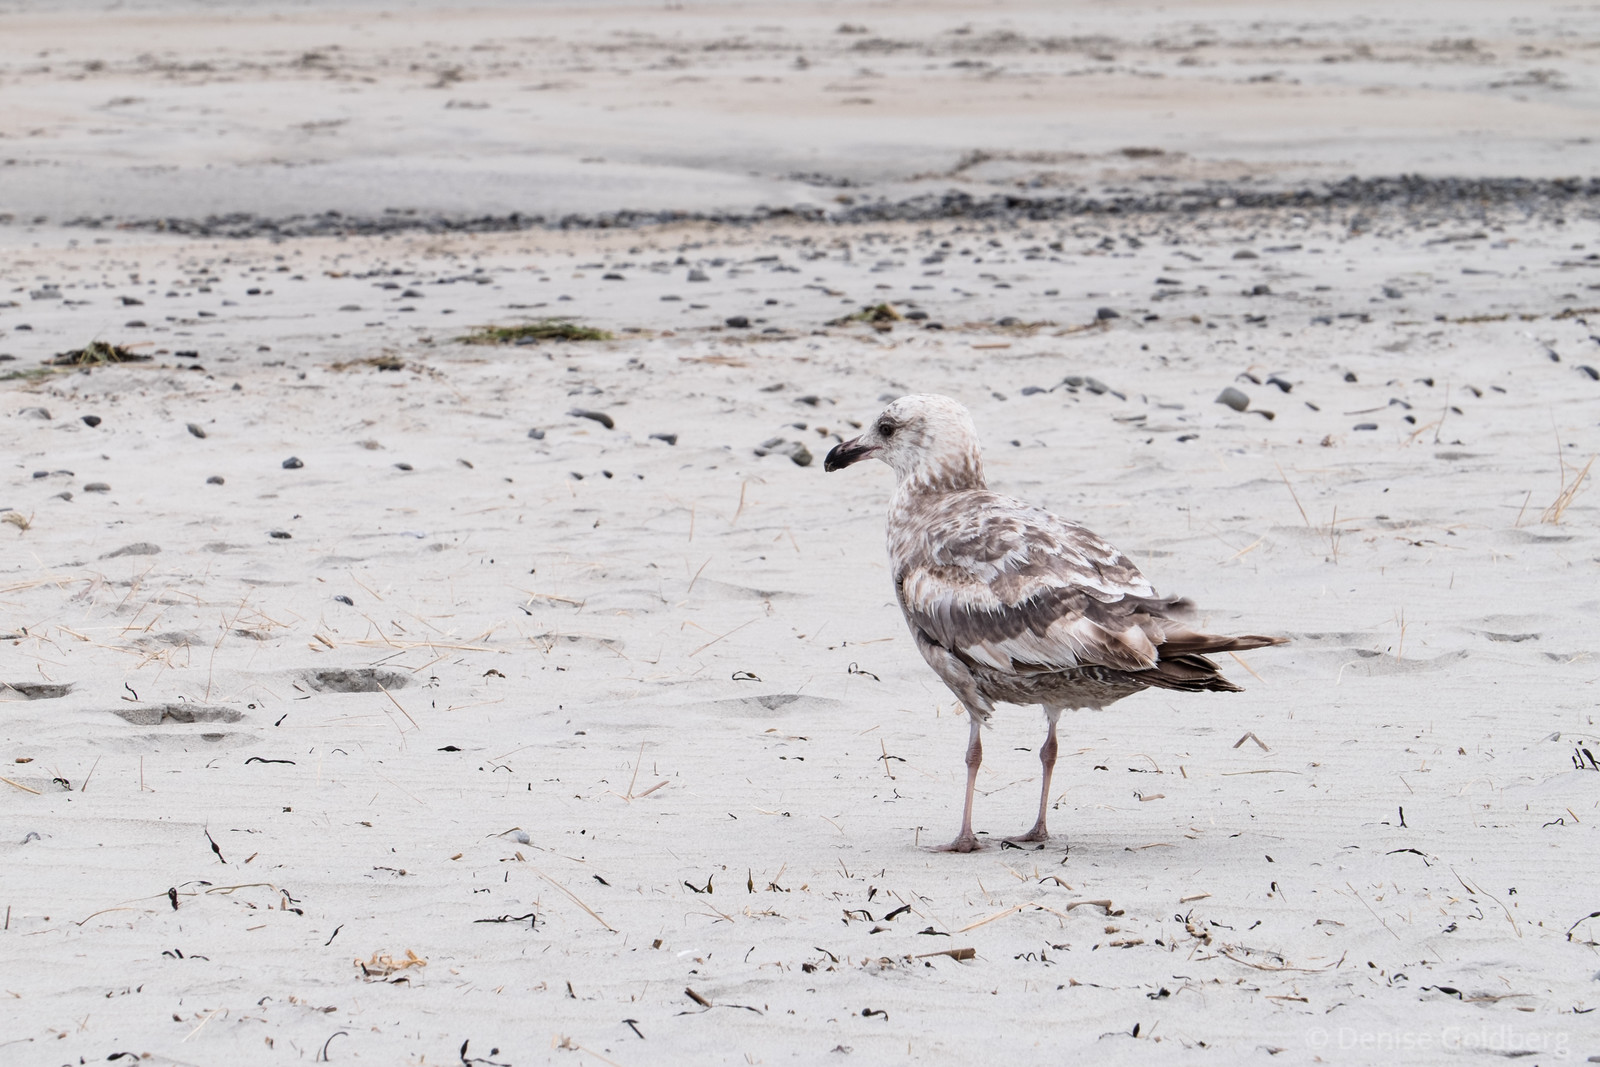 a sea gull, blending in